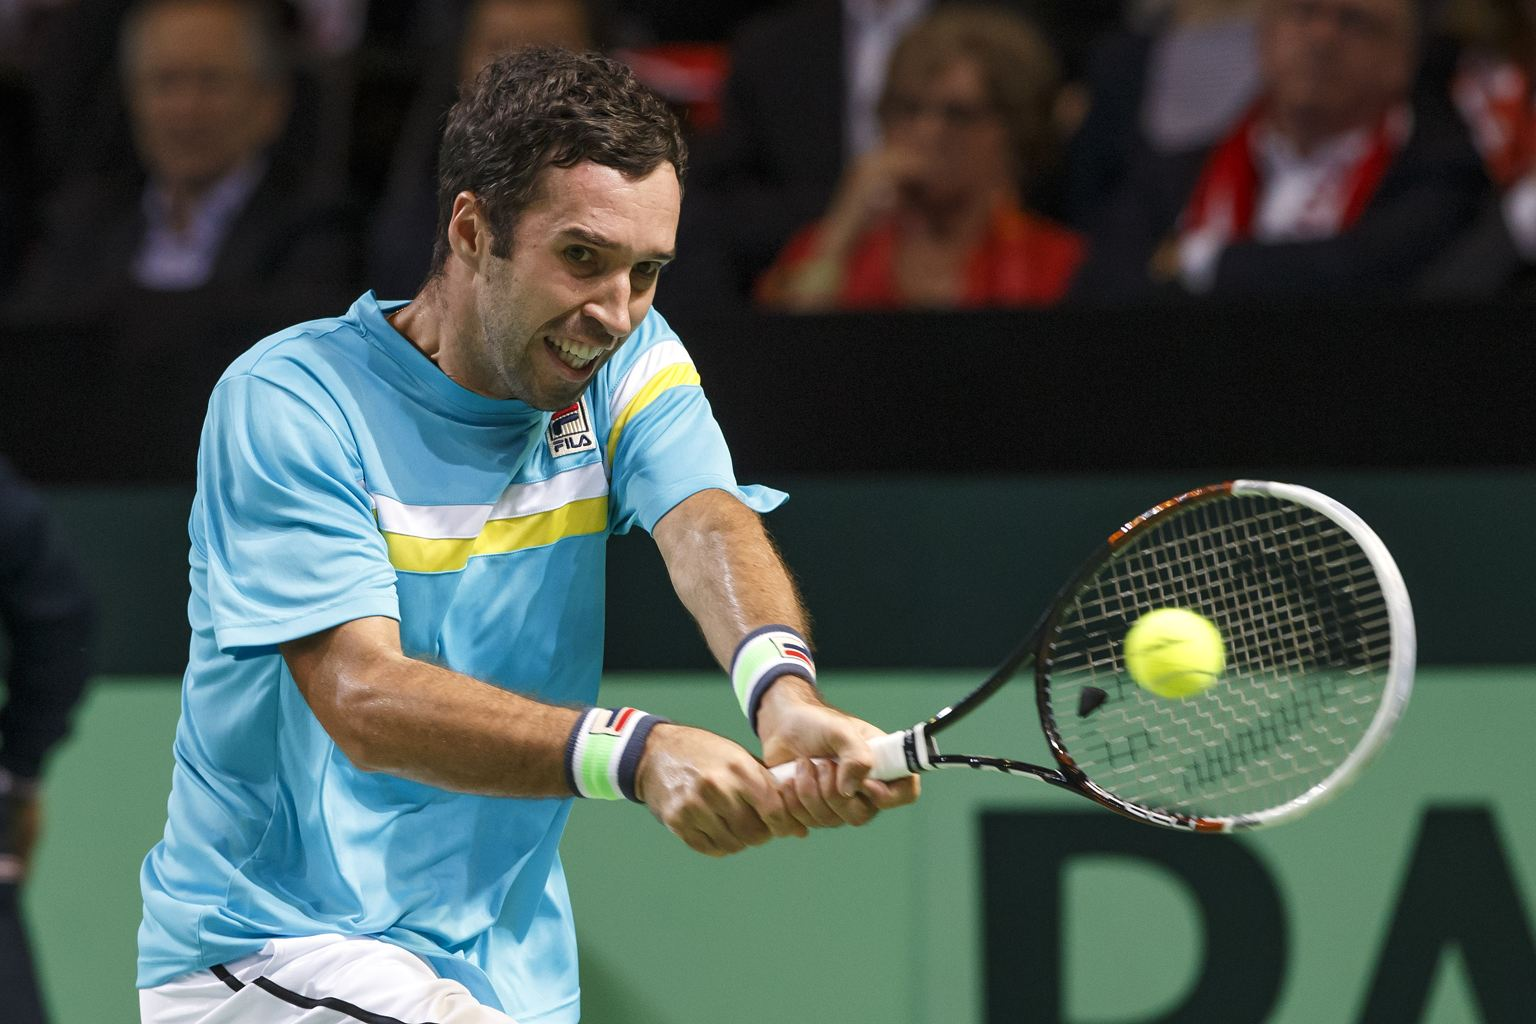 Казахстанец уступил французскому теннисисту на старте Australian Open